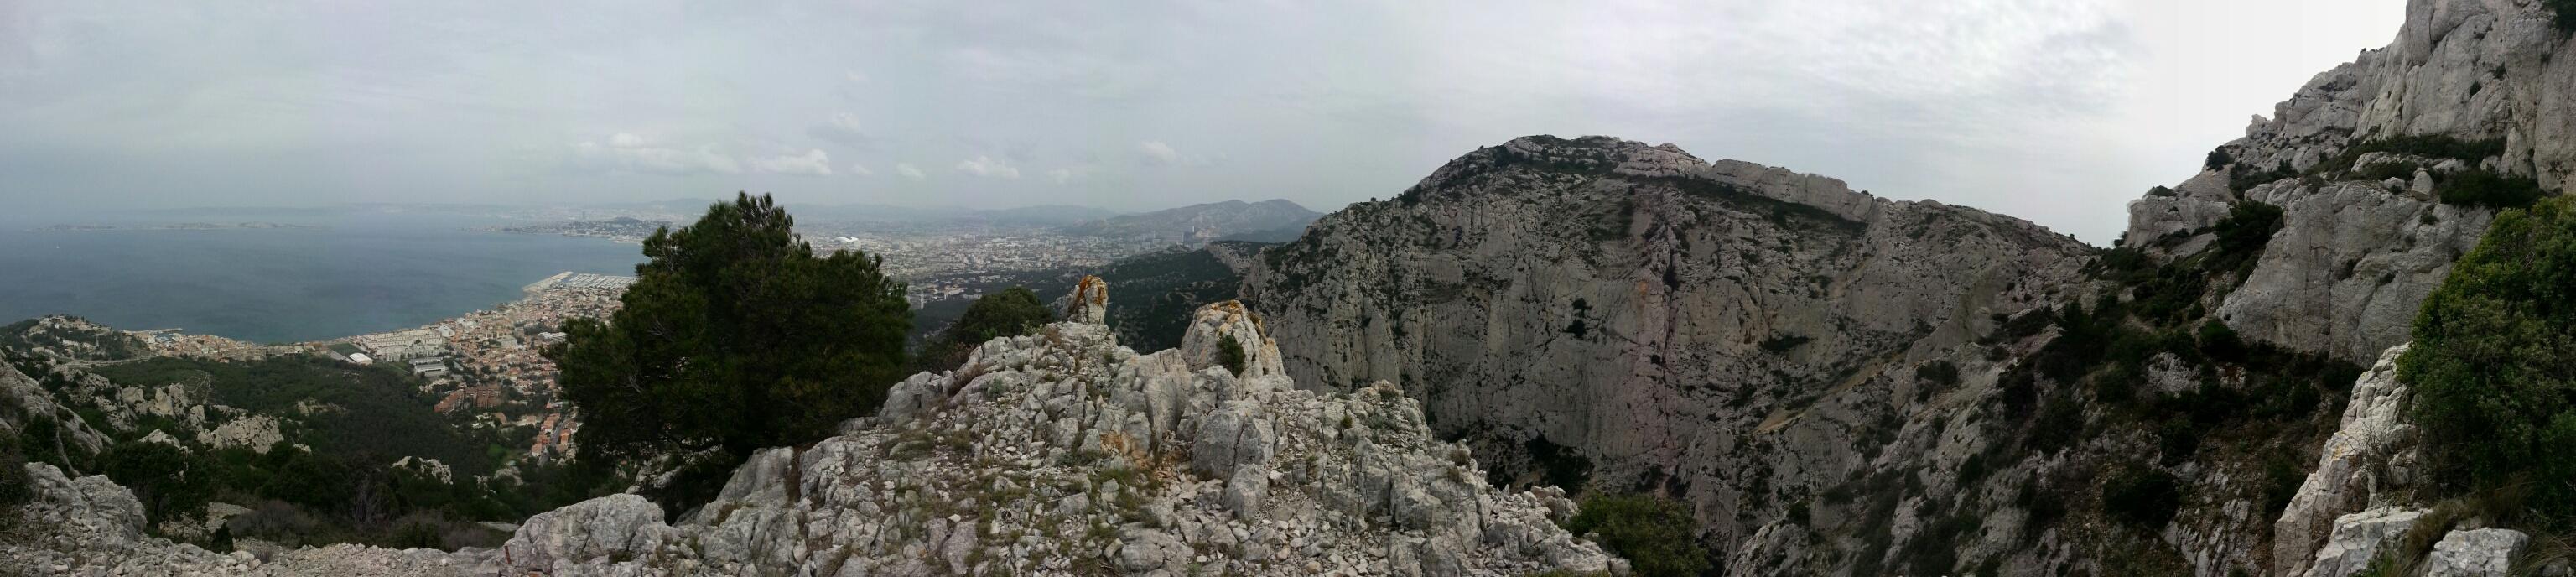 Calanques hiking